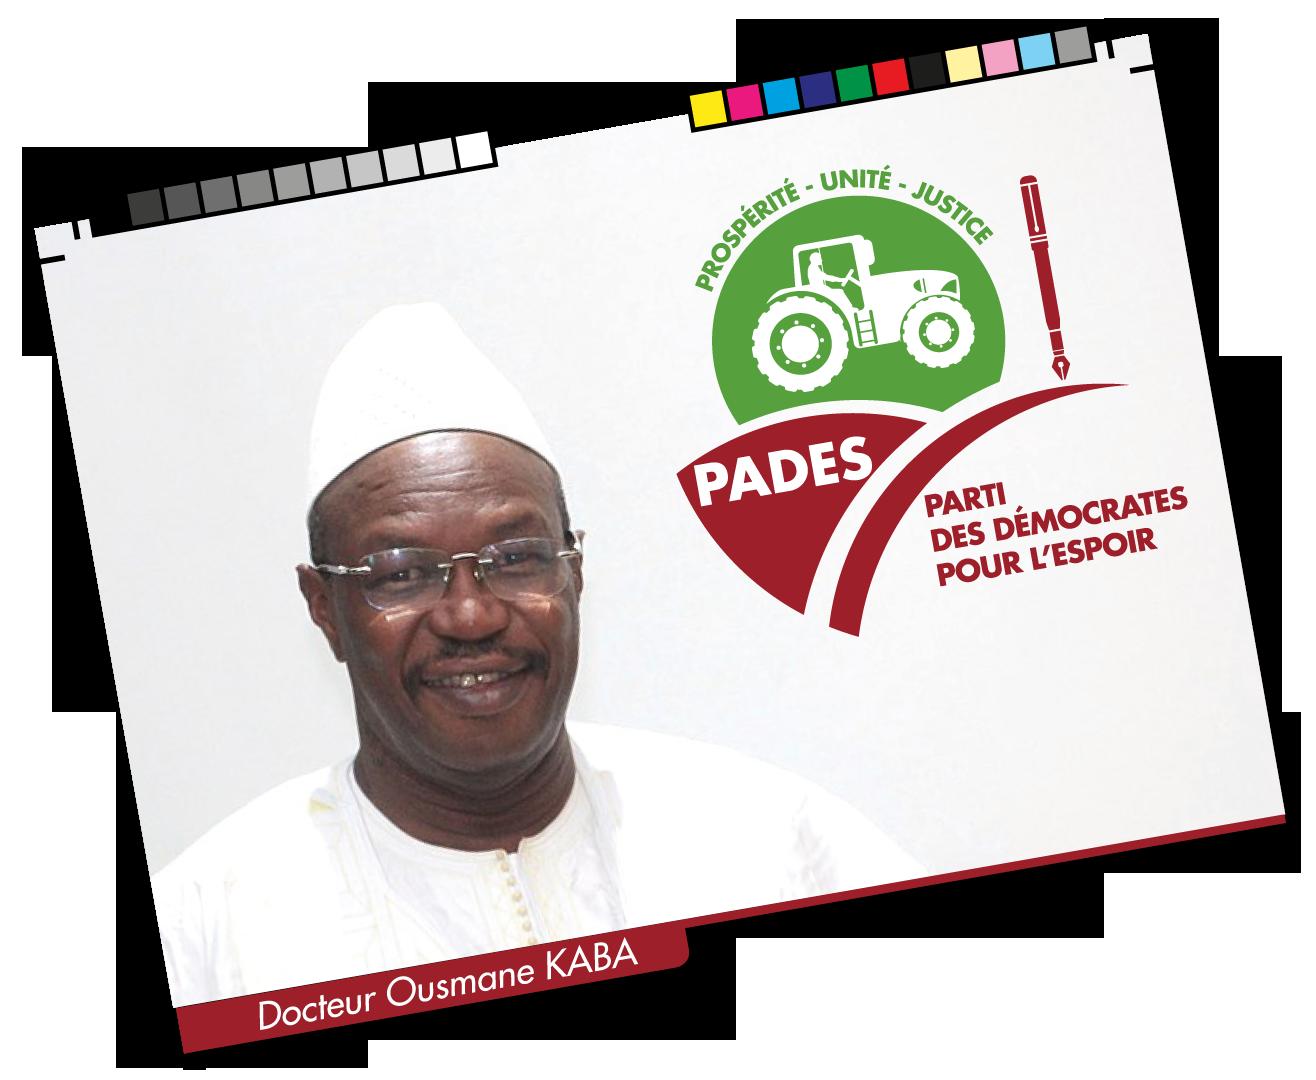 Illustration Dr. Ousmane KABA, Président du PADES